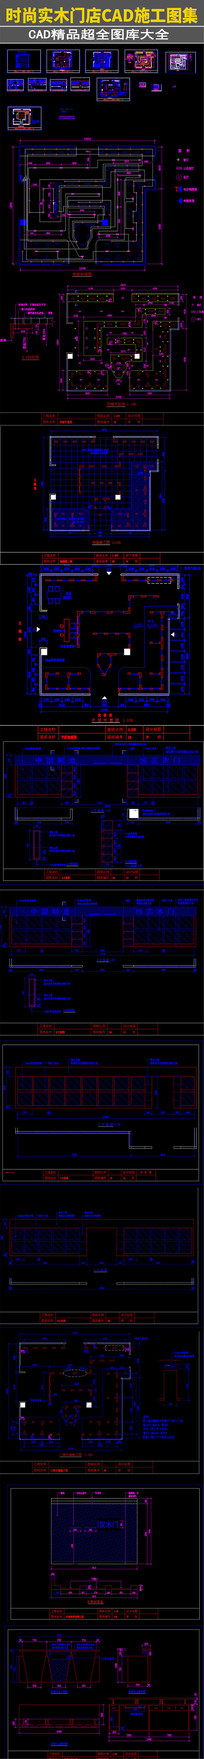 时尚实木门店CAD施工图